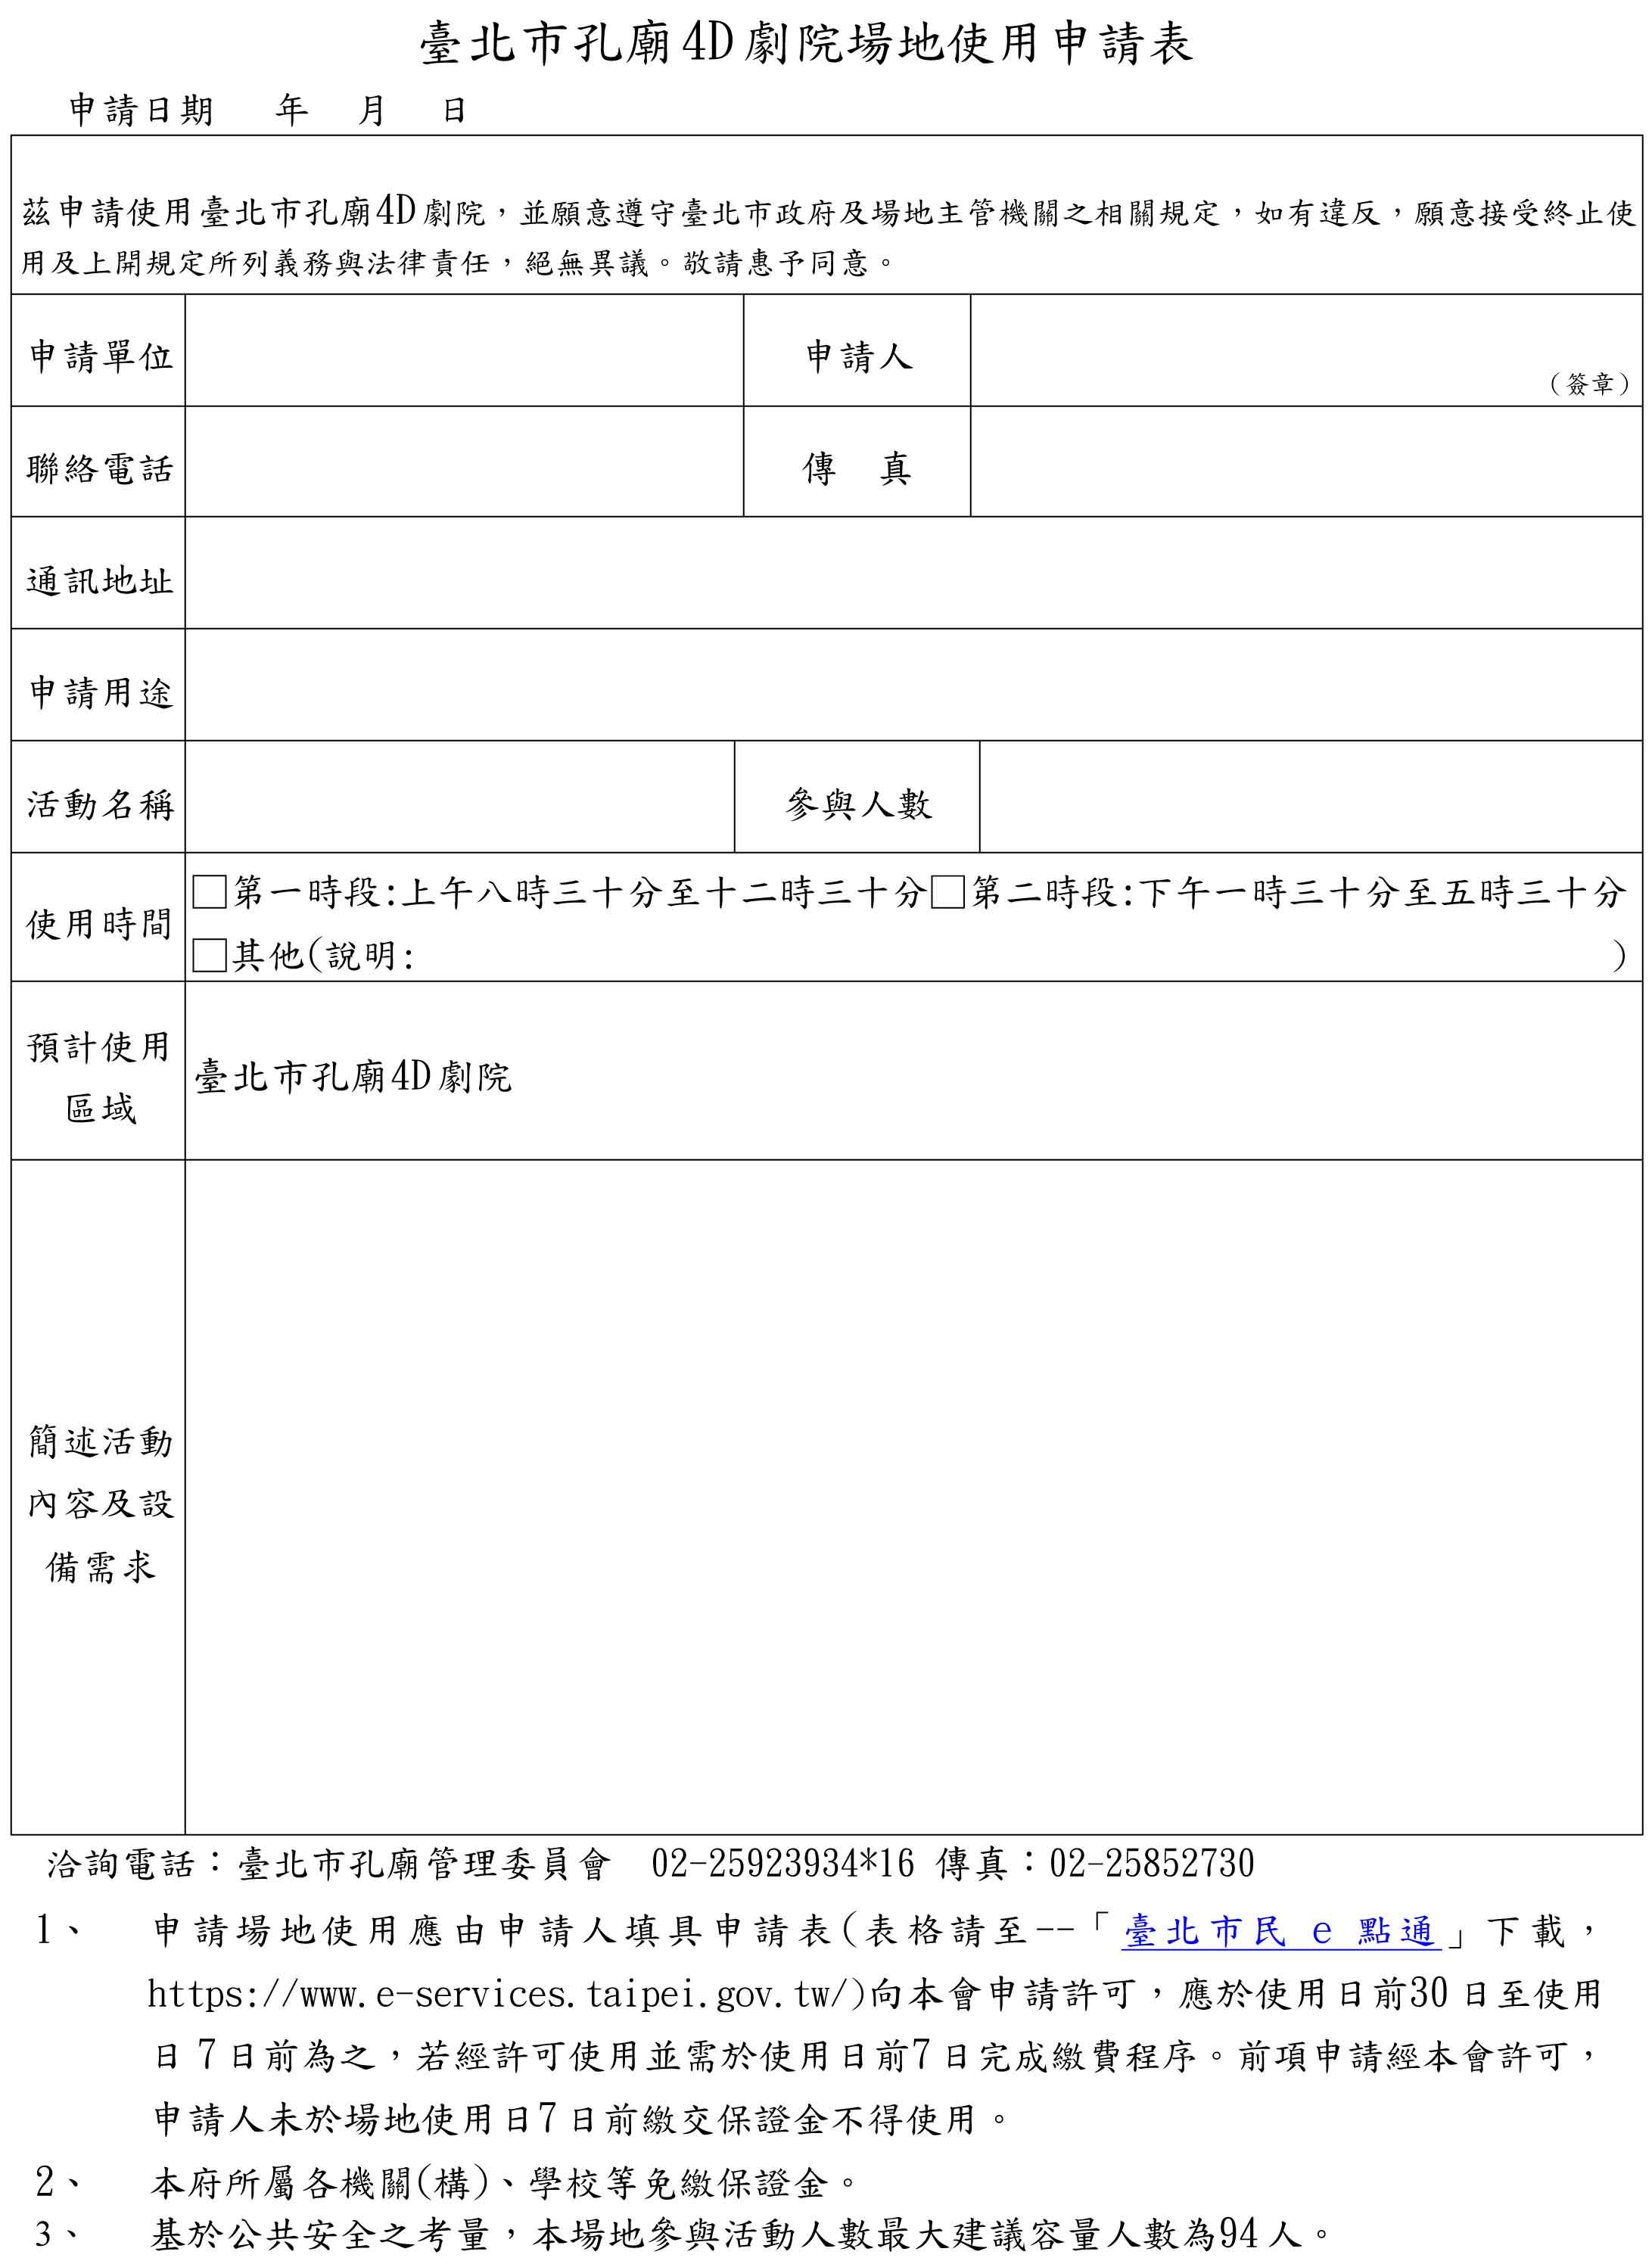 4D劇院場地申請表